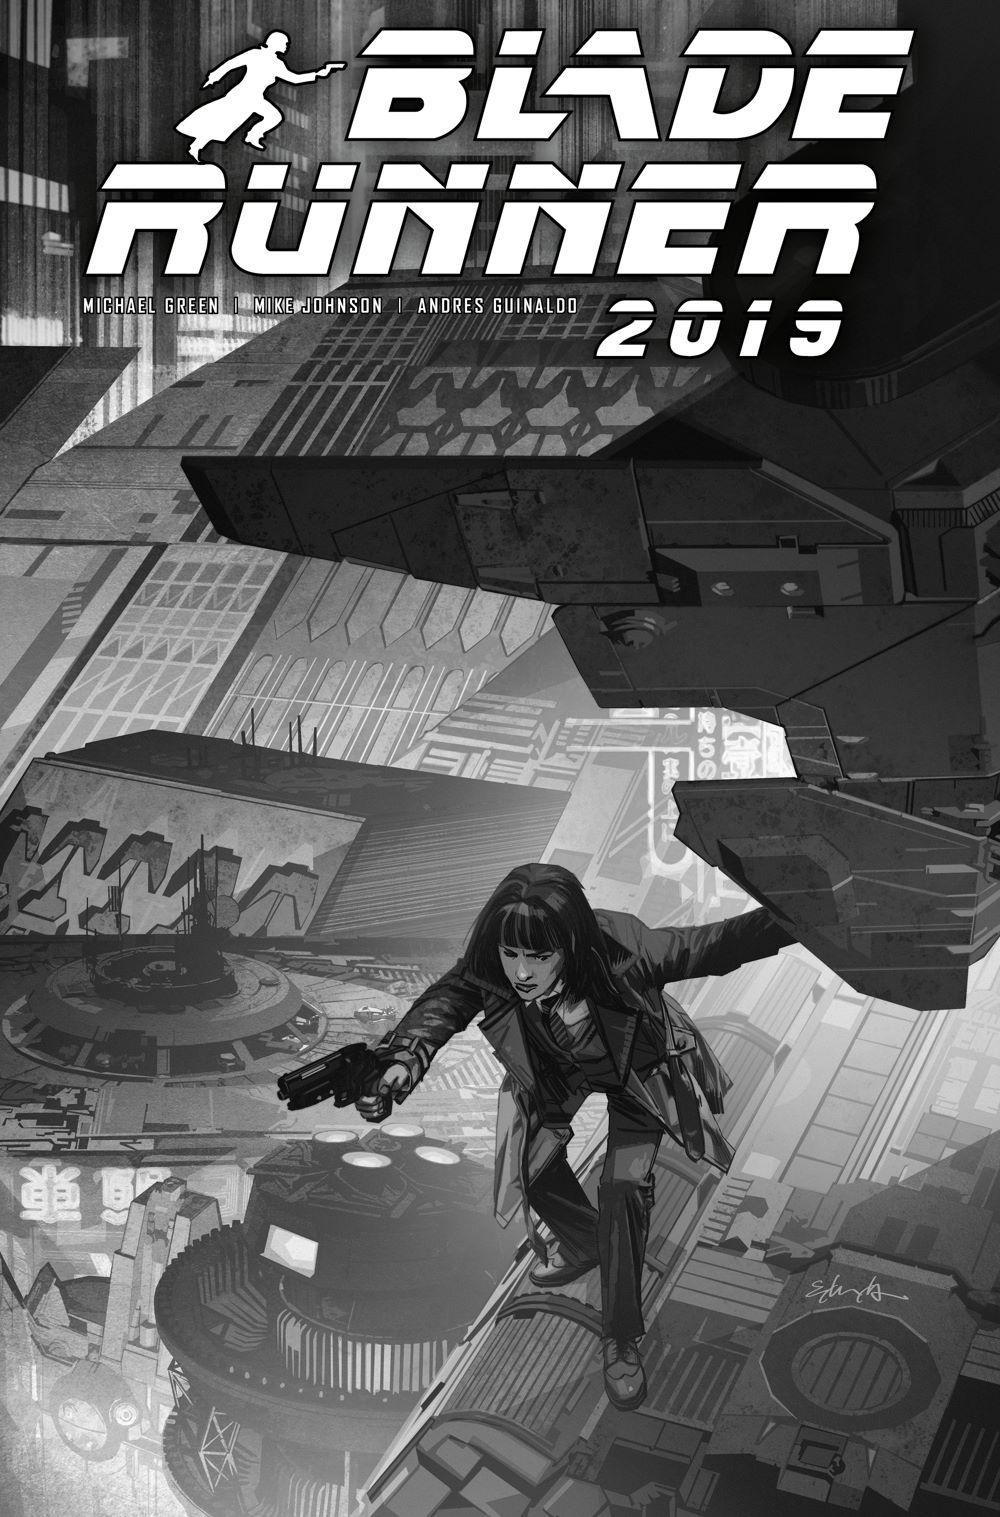 Blade-Runner-2019-9E ComicList Previews: BLADE RUNNER 2019 #9